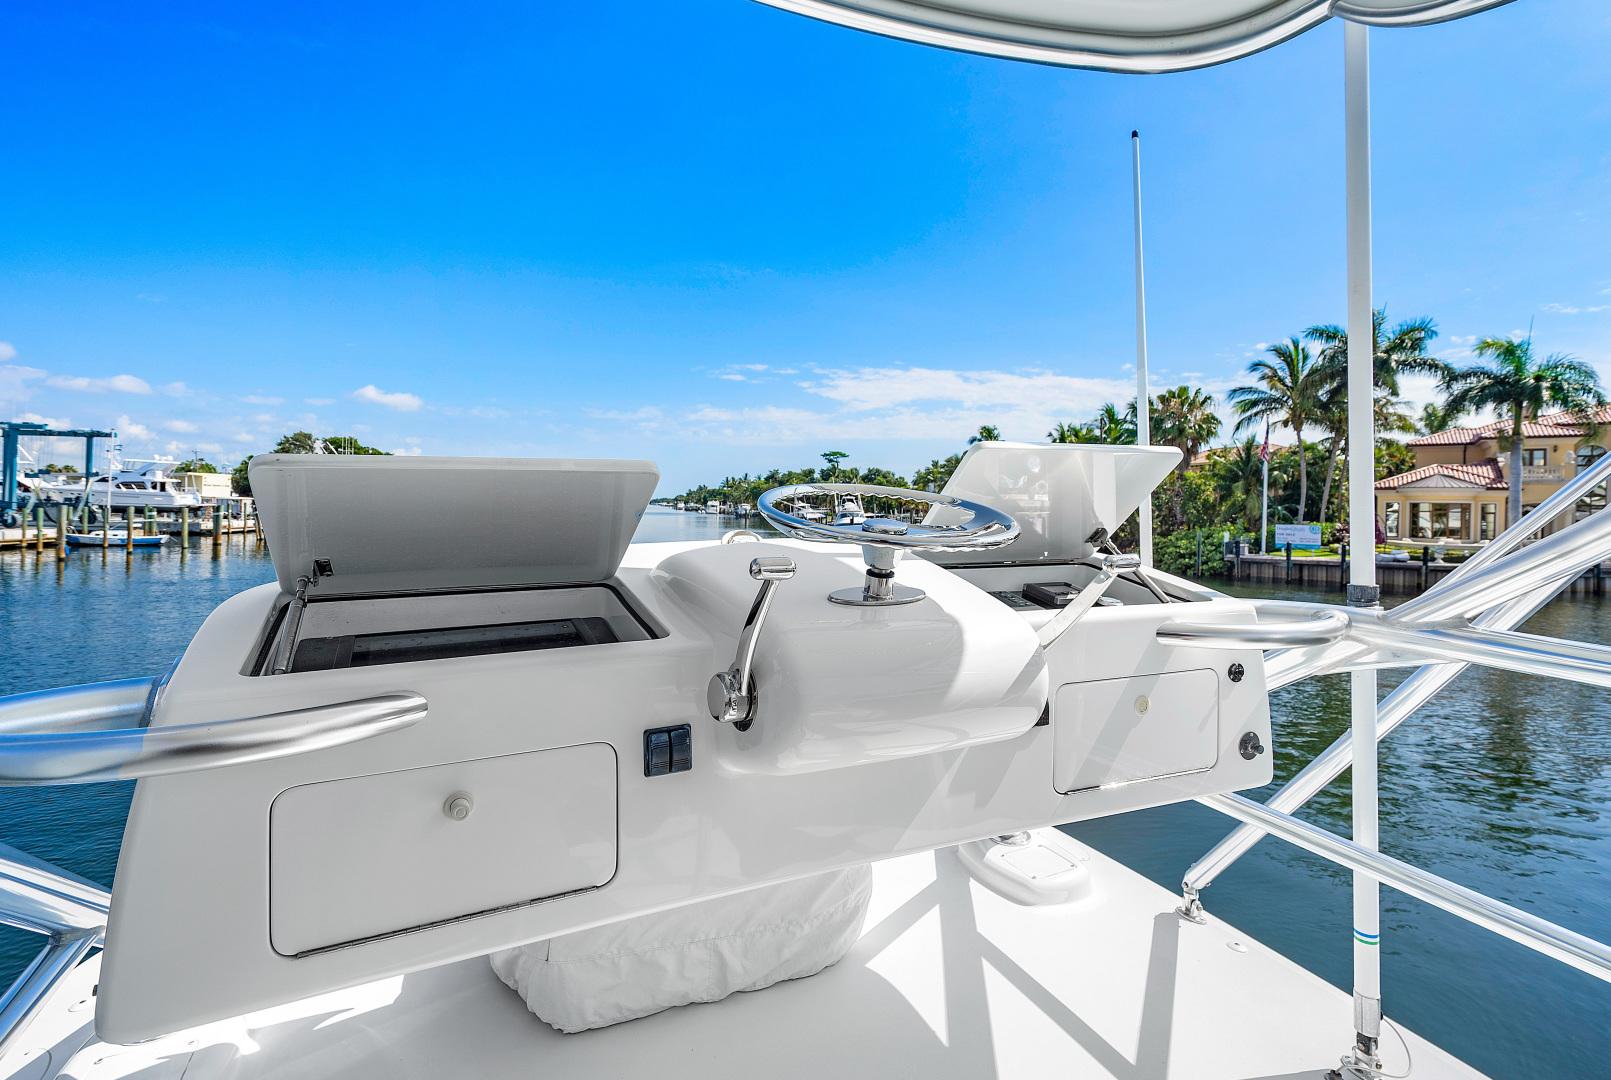 Release-Walkaround 2014-De Bowat Palm Beach Gardens-United States-1364502 | Thumbnail